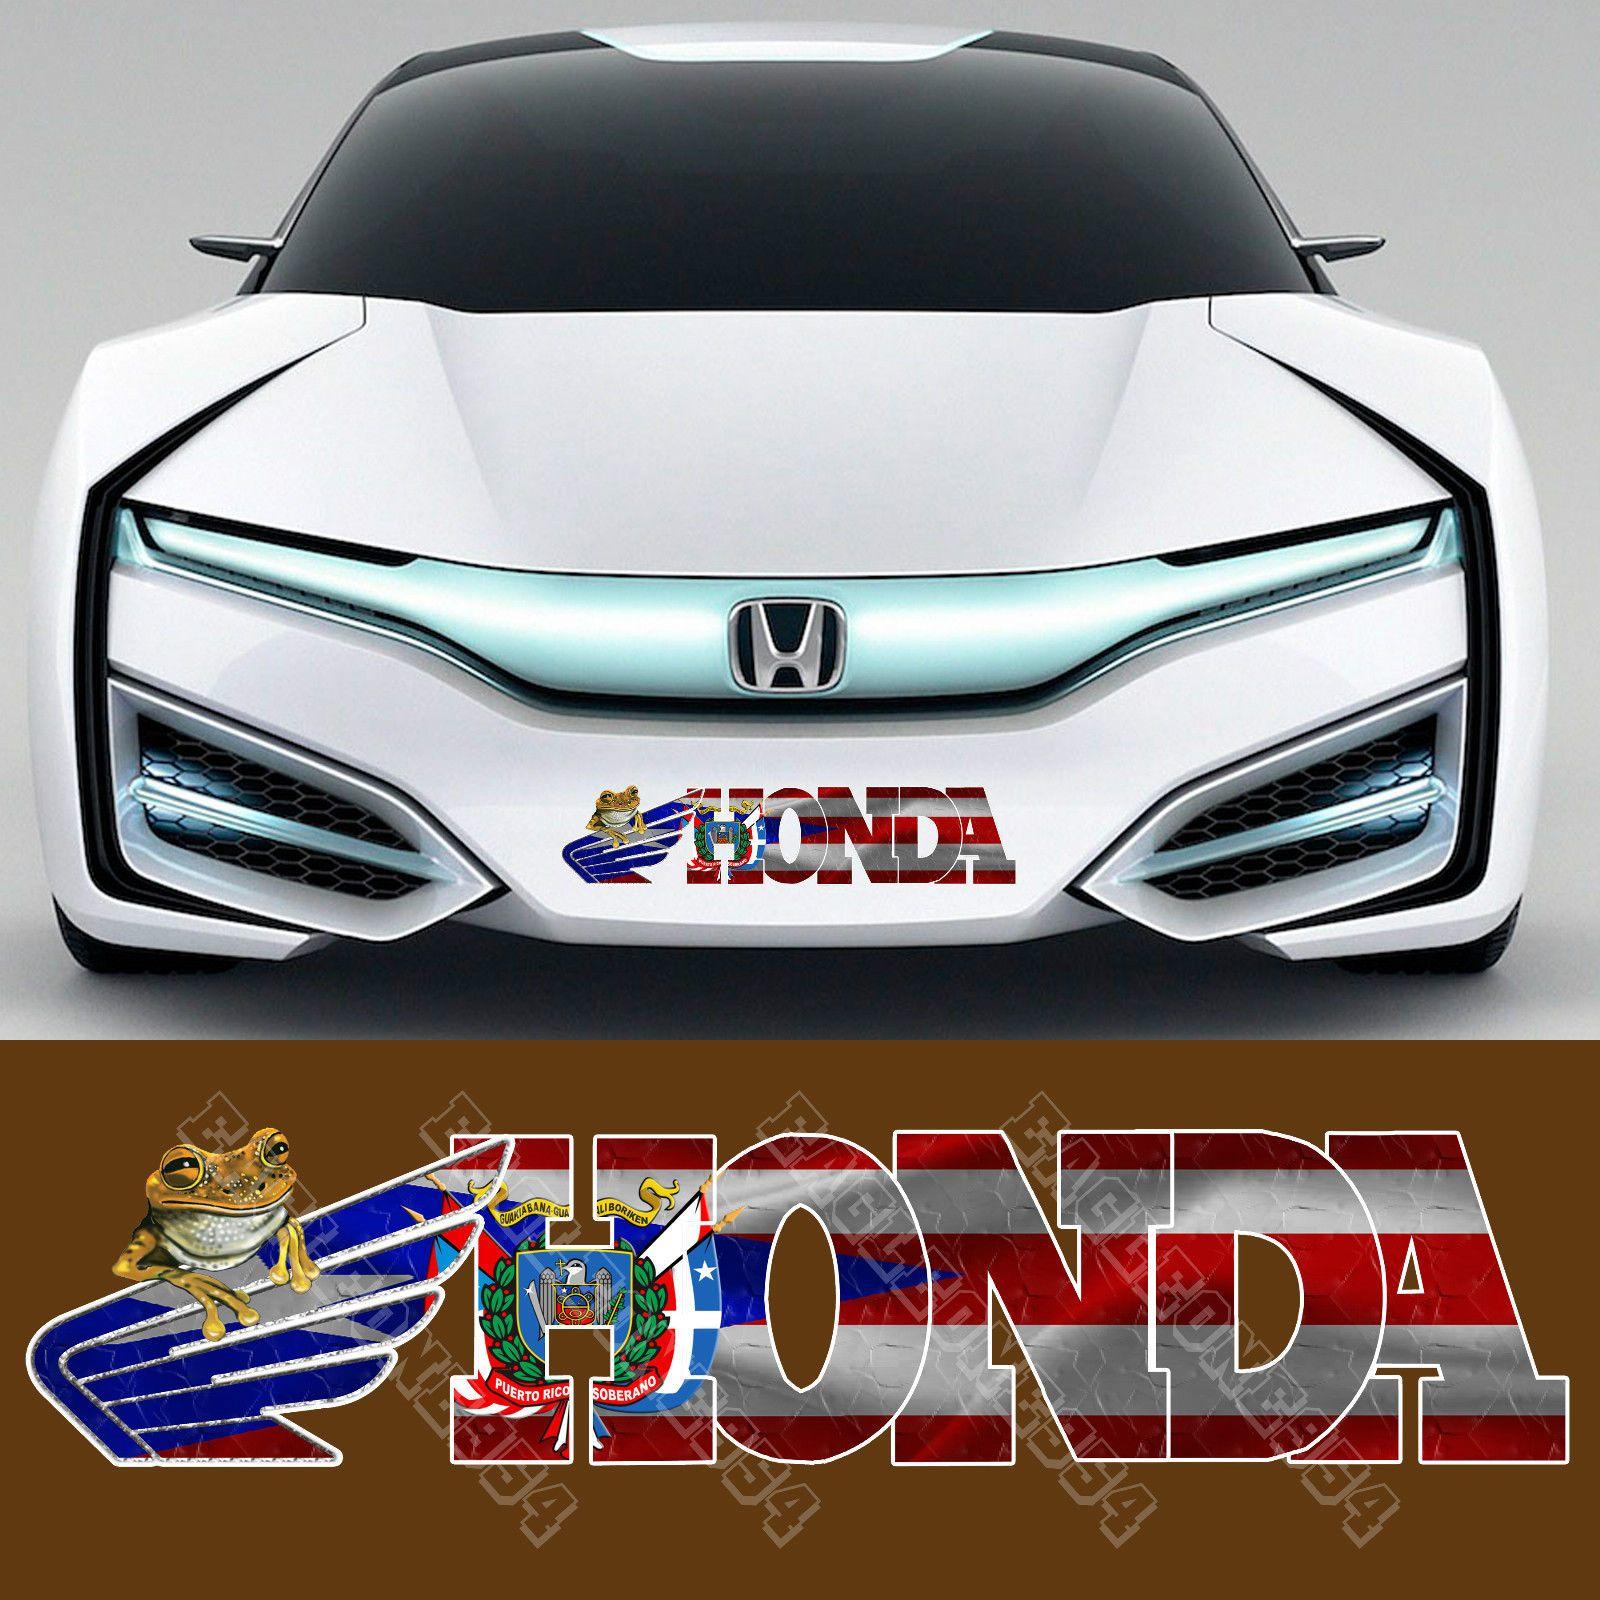 Design car flags - 1x Puerto Rico Flag Decal Puerto Rican Flag Decal 15 W X 3 75 H